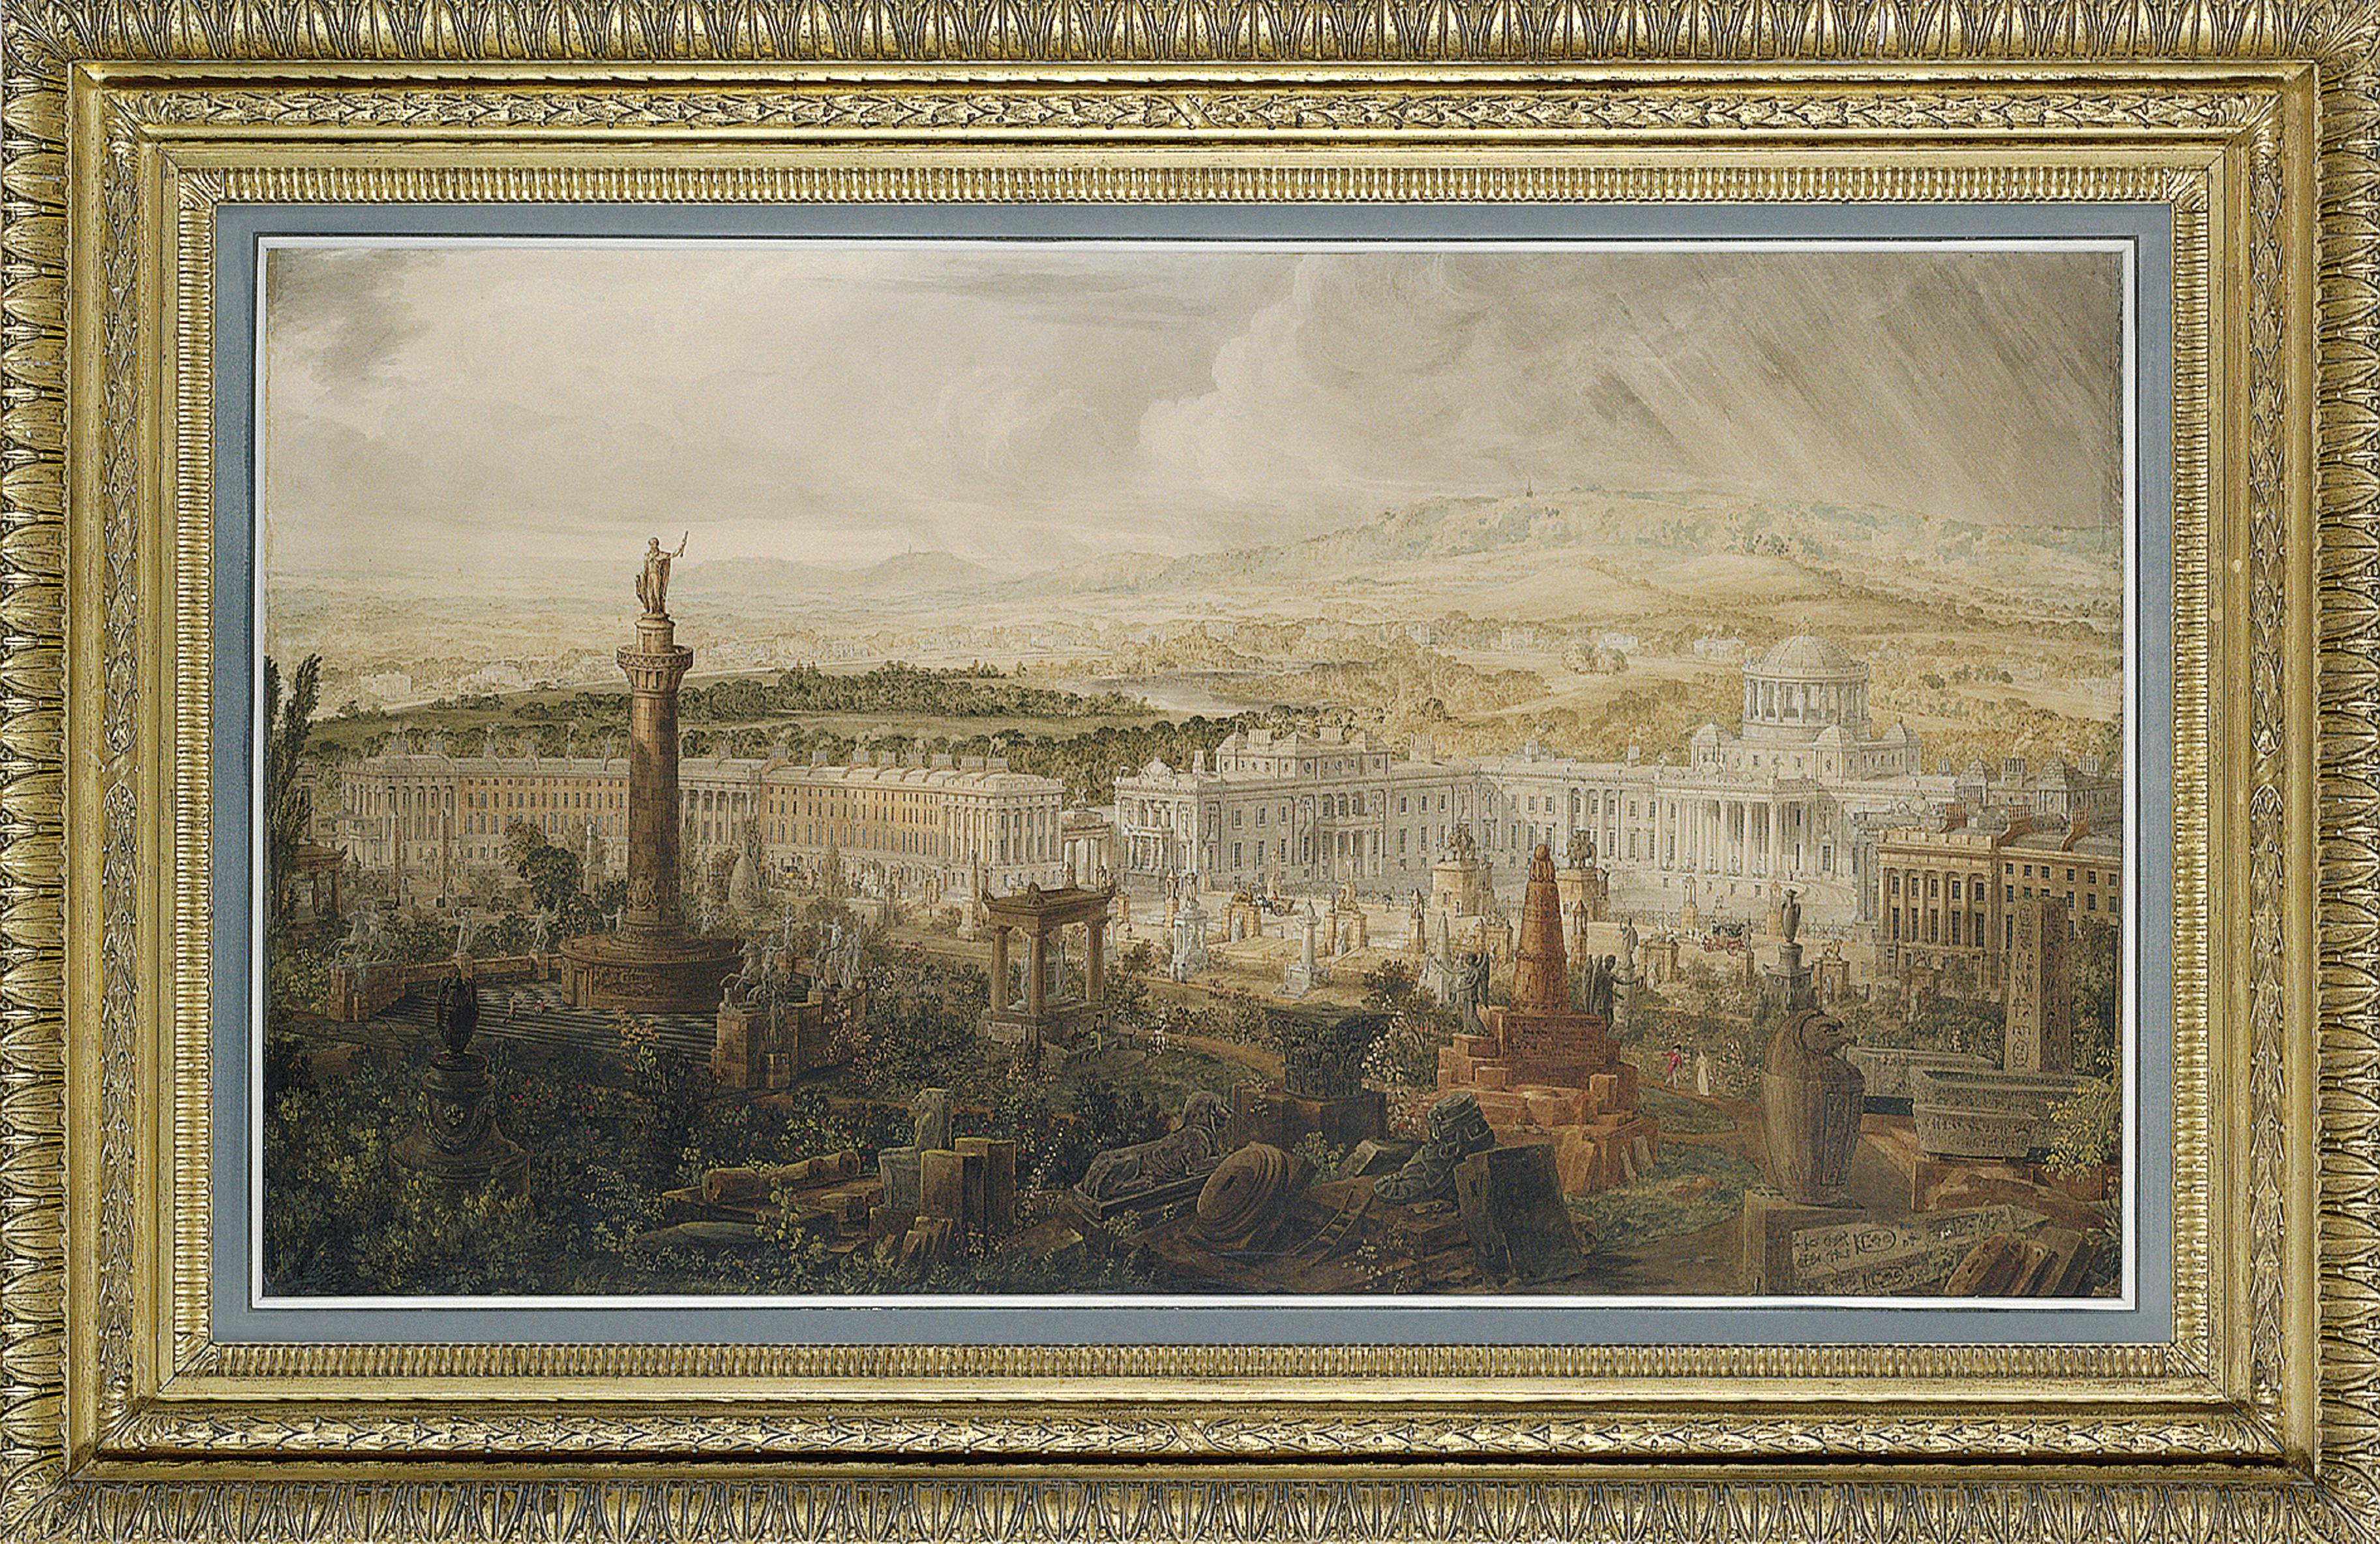 Joseph Michael Gandy, A.R.A. (